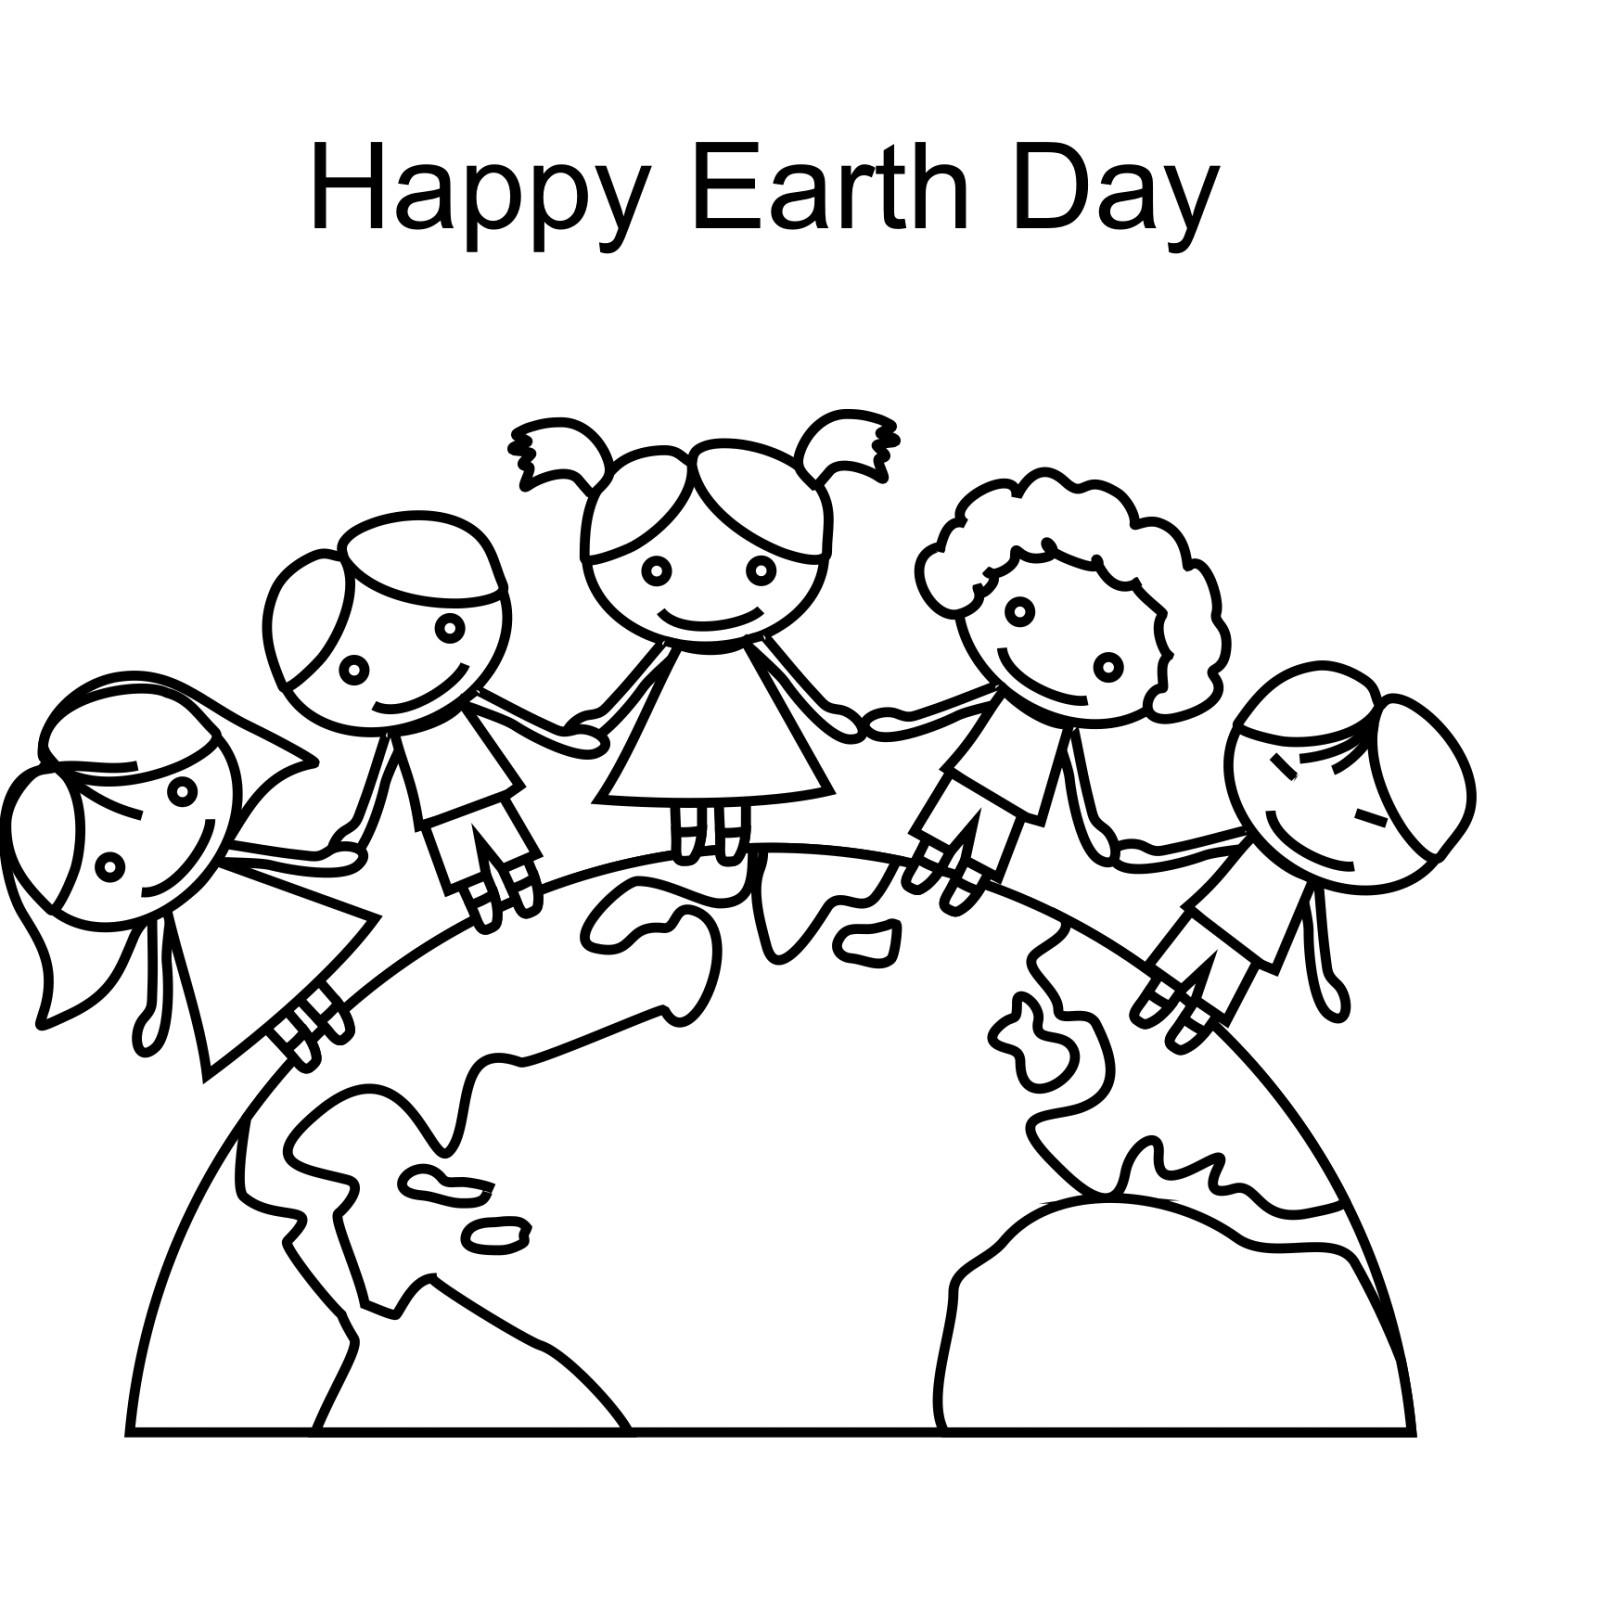 Earth Day Coloring Pages Earth Day Coloring Pages Kindergarten For Kids 16001600 Page 6